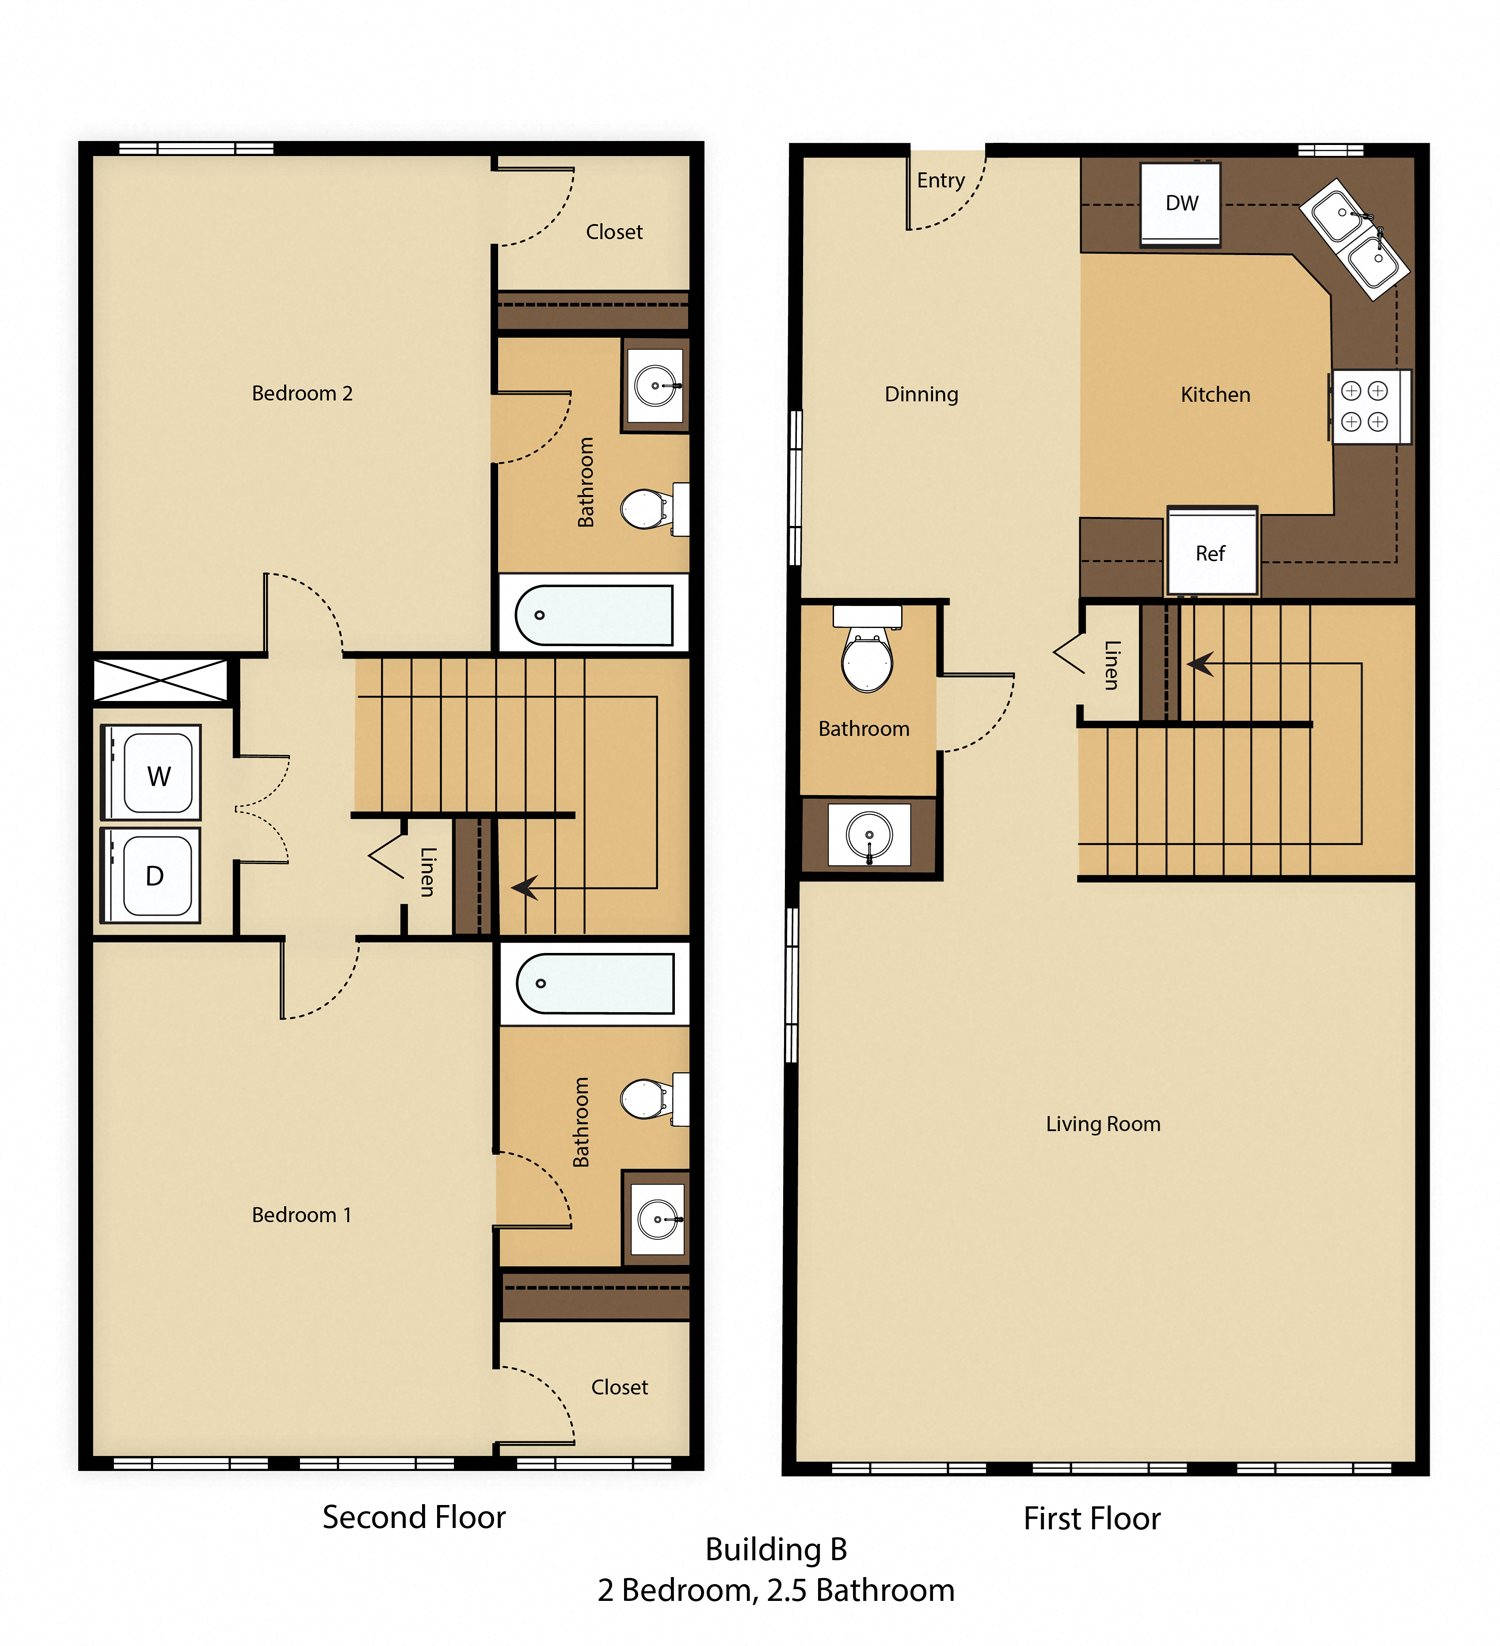 Floor Plans of SHA7 Apartments in Spartanburg, SC